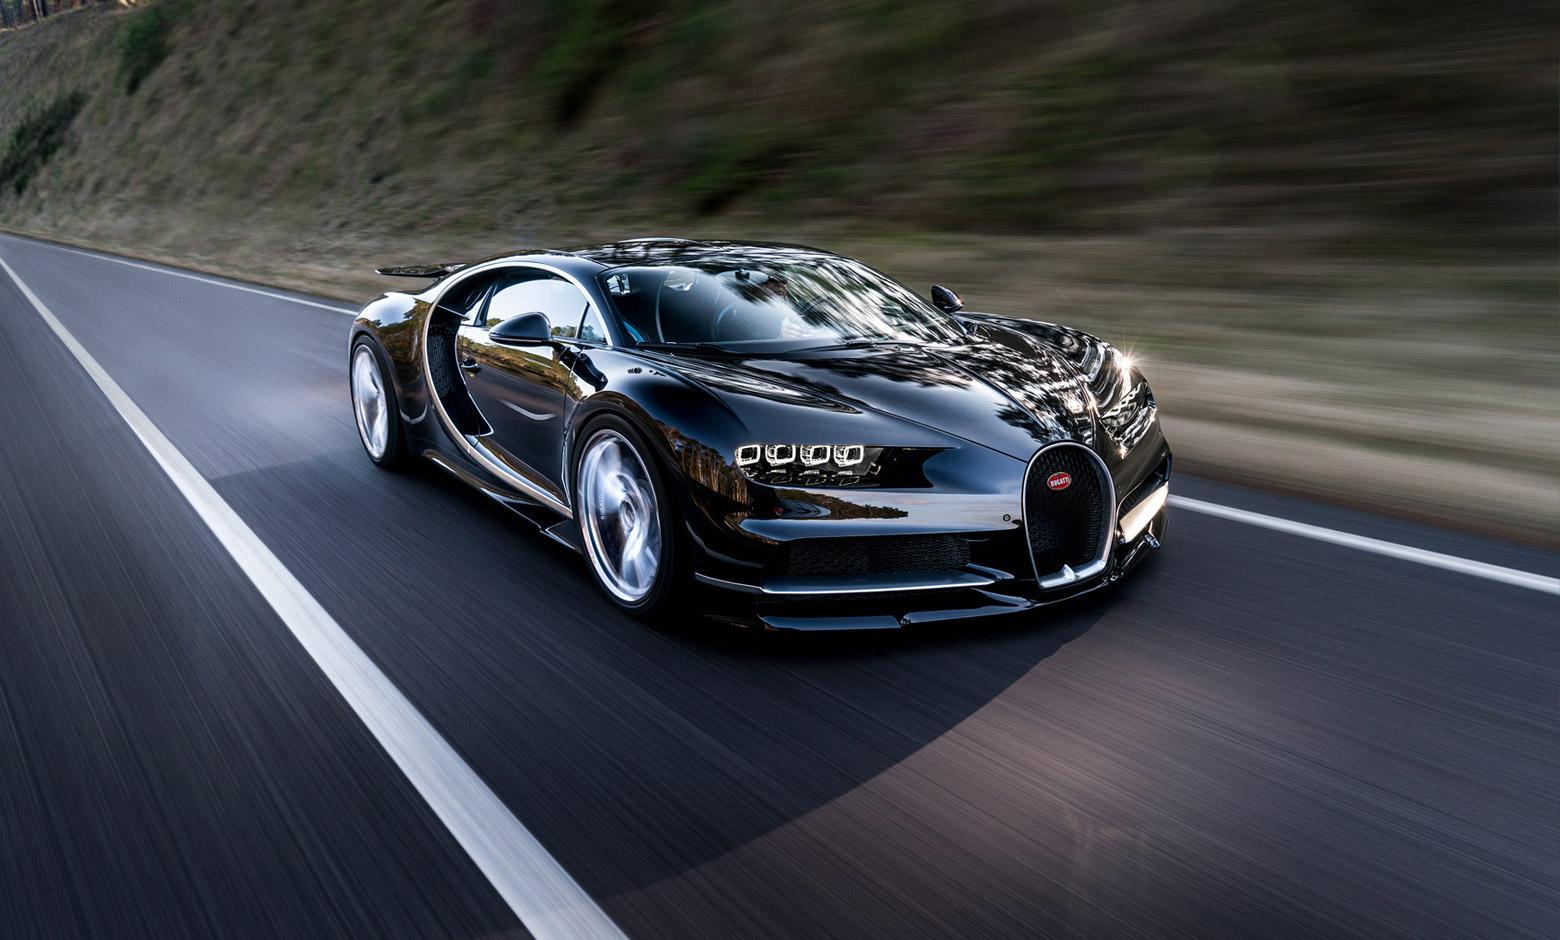 Bugatti Chiron Sets Record for Fastest Production Car